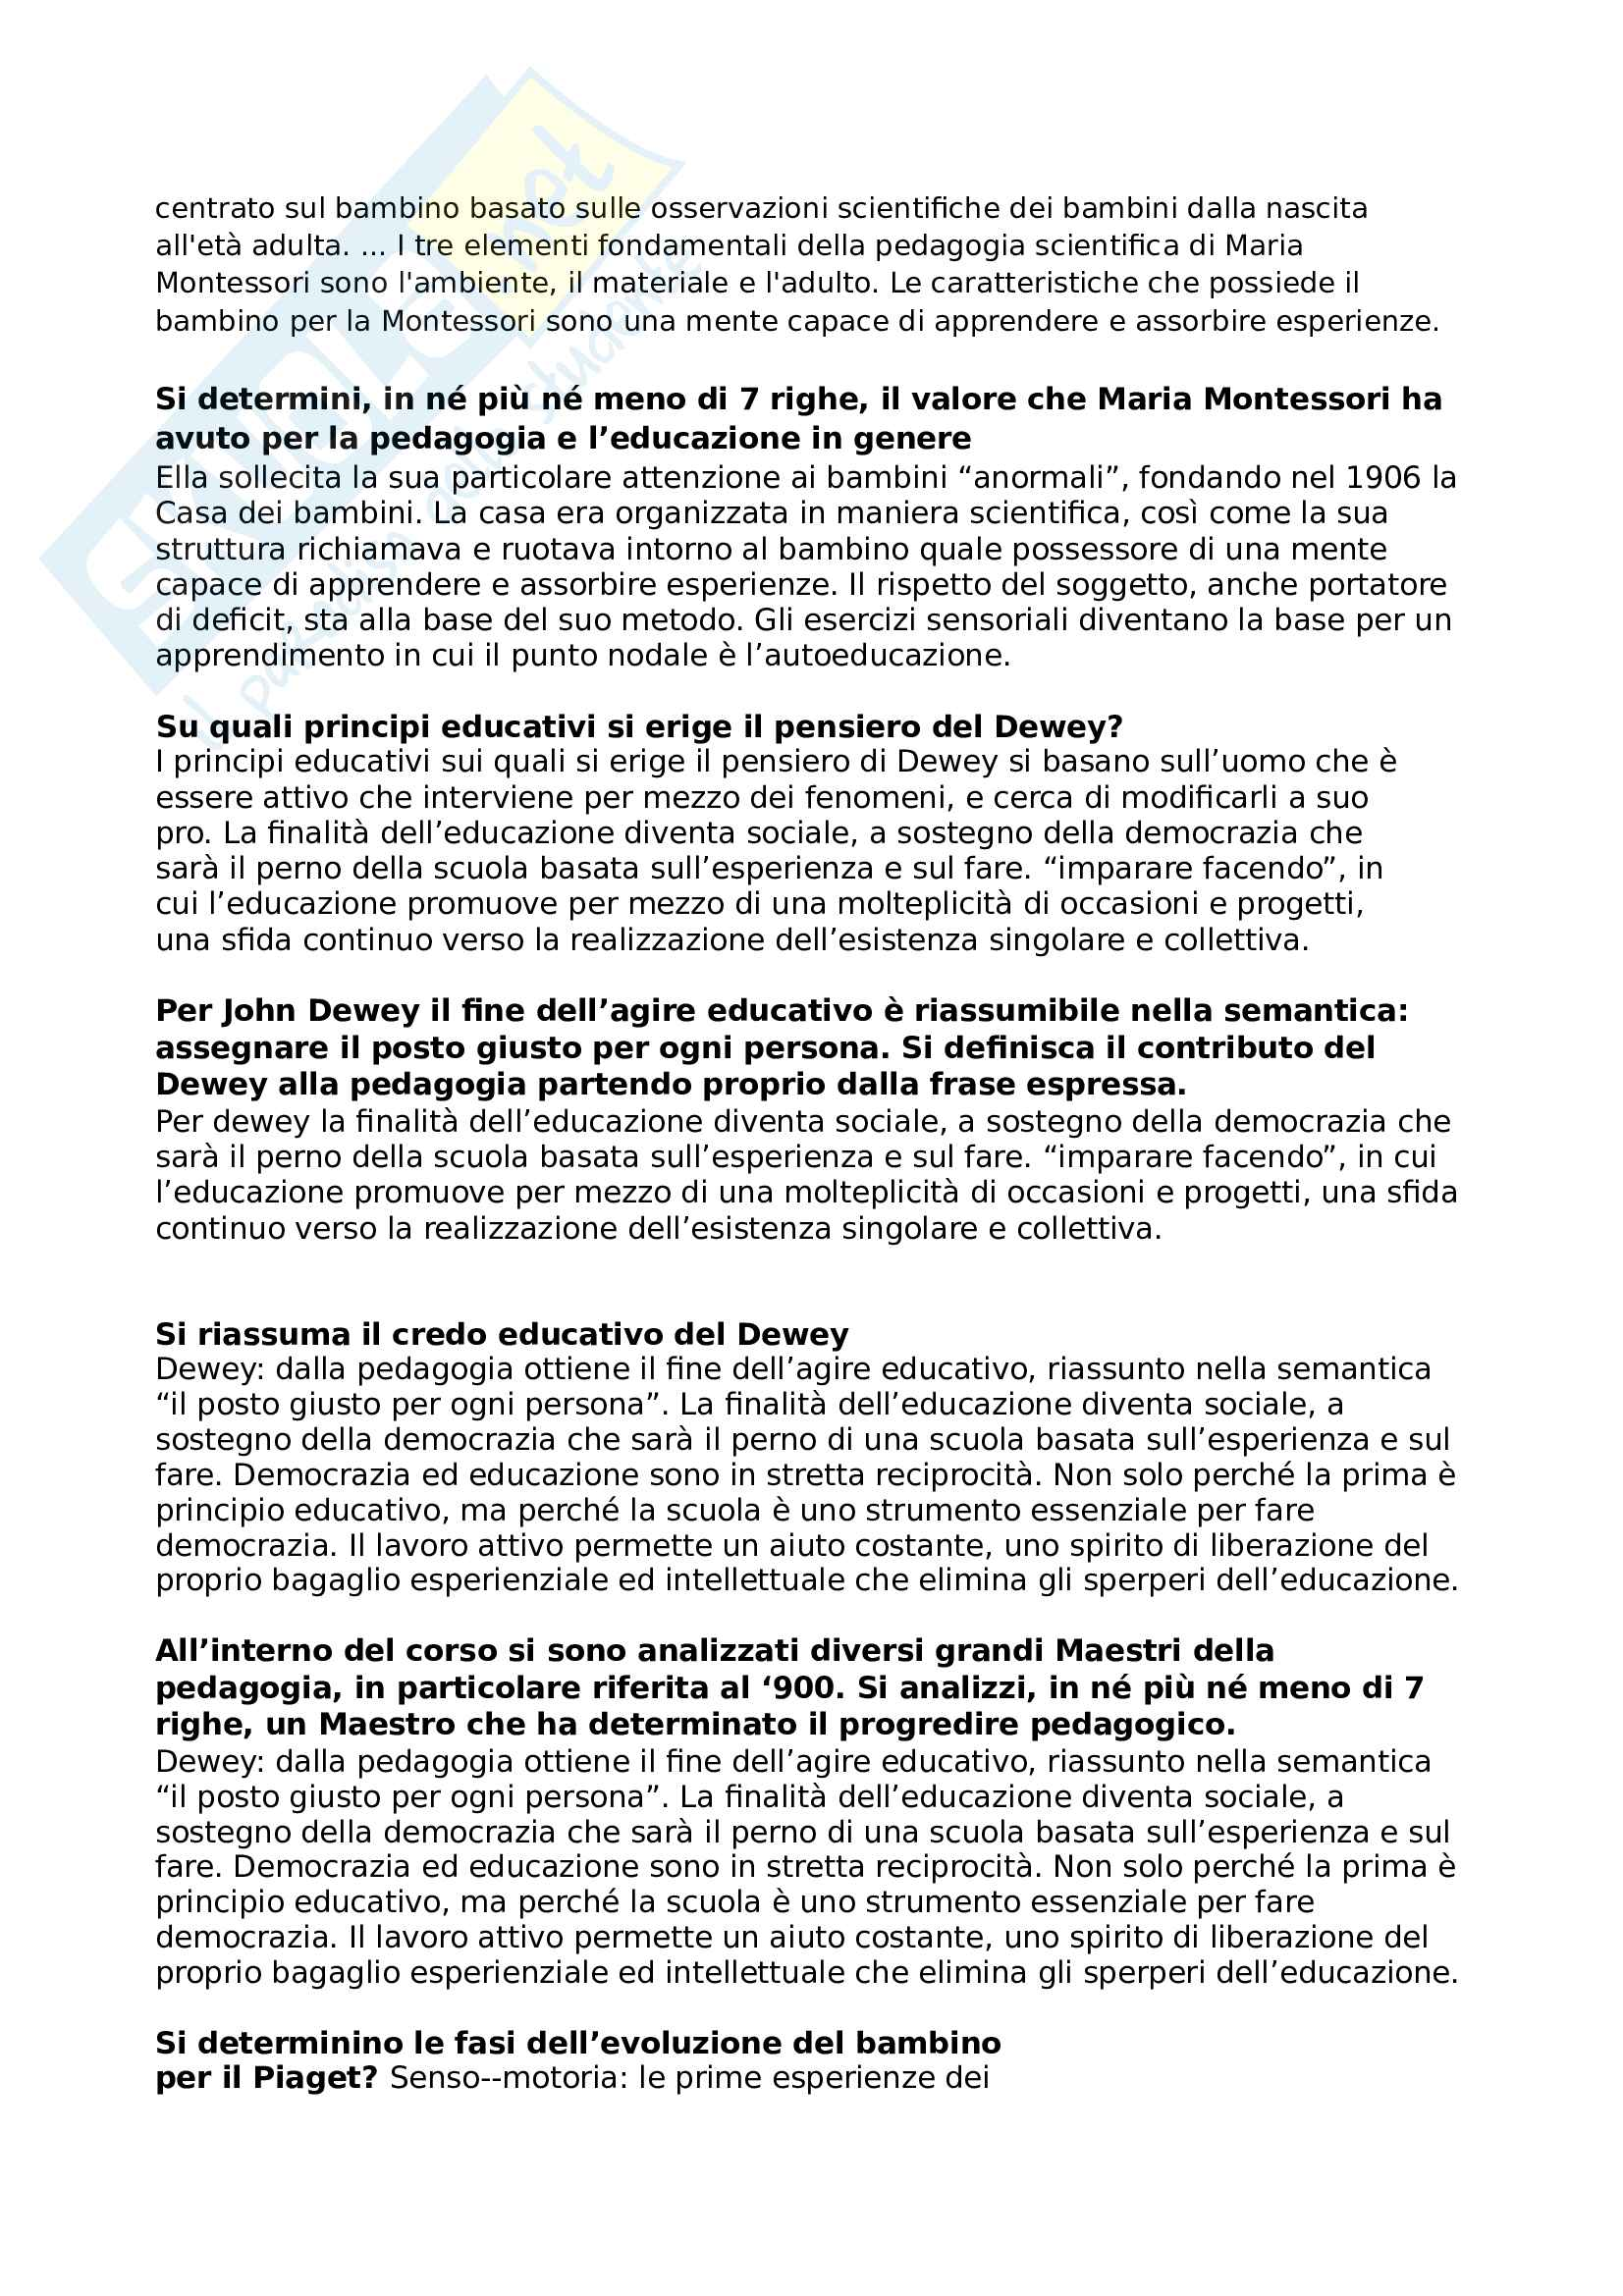 Paniere domande multiple pedagogia generale e sociale Pag. 11